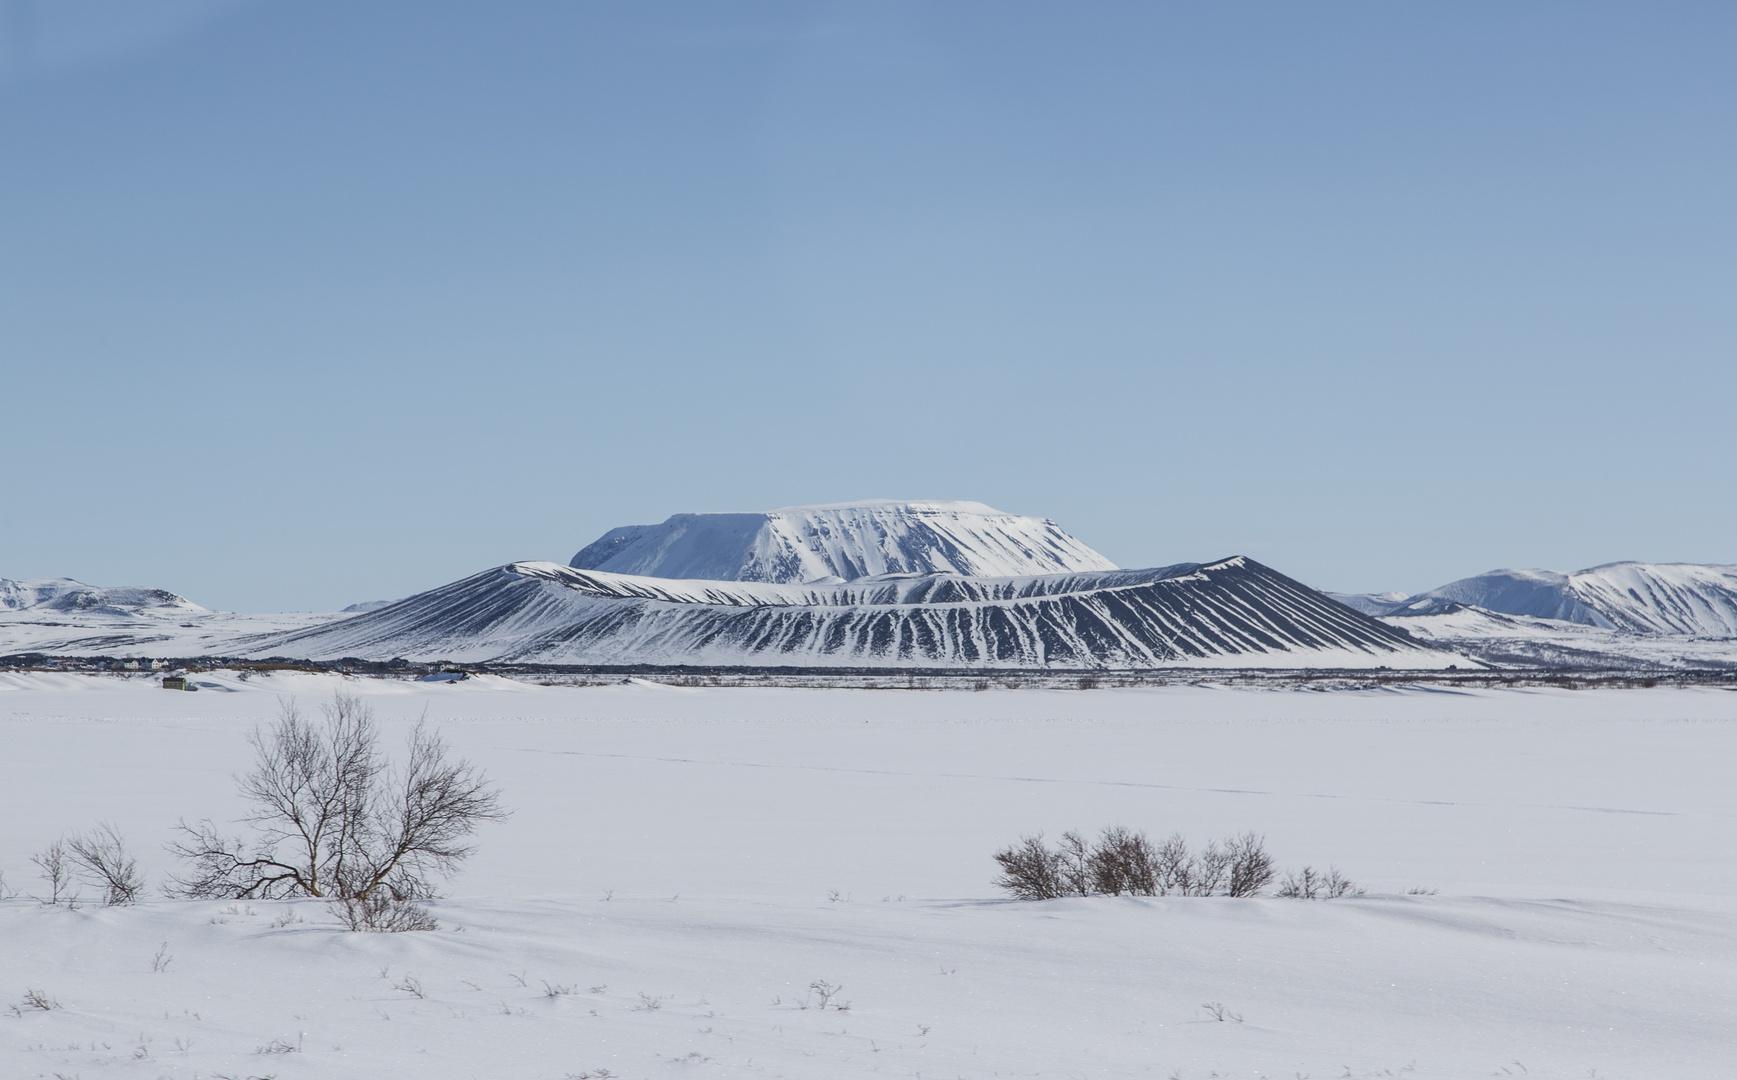 Blick auf Vulkan Hverfell von Dimmoborgir aus